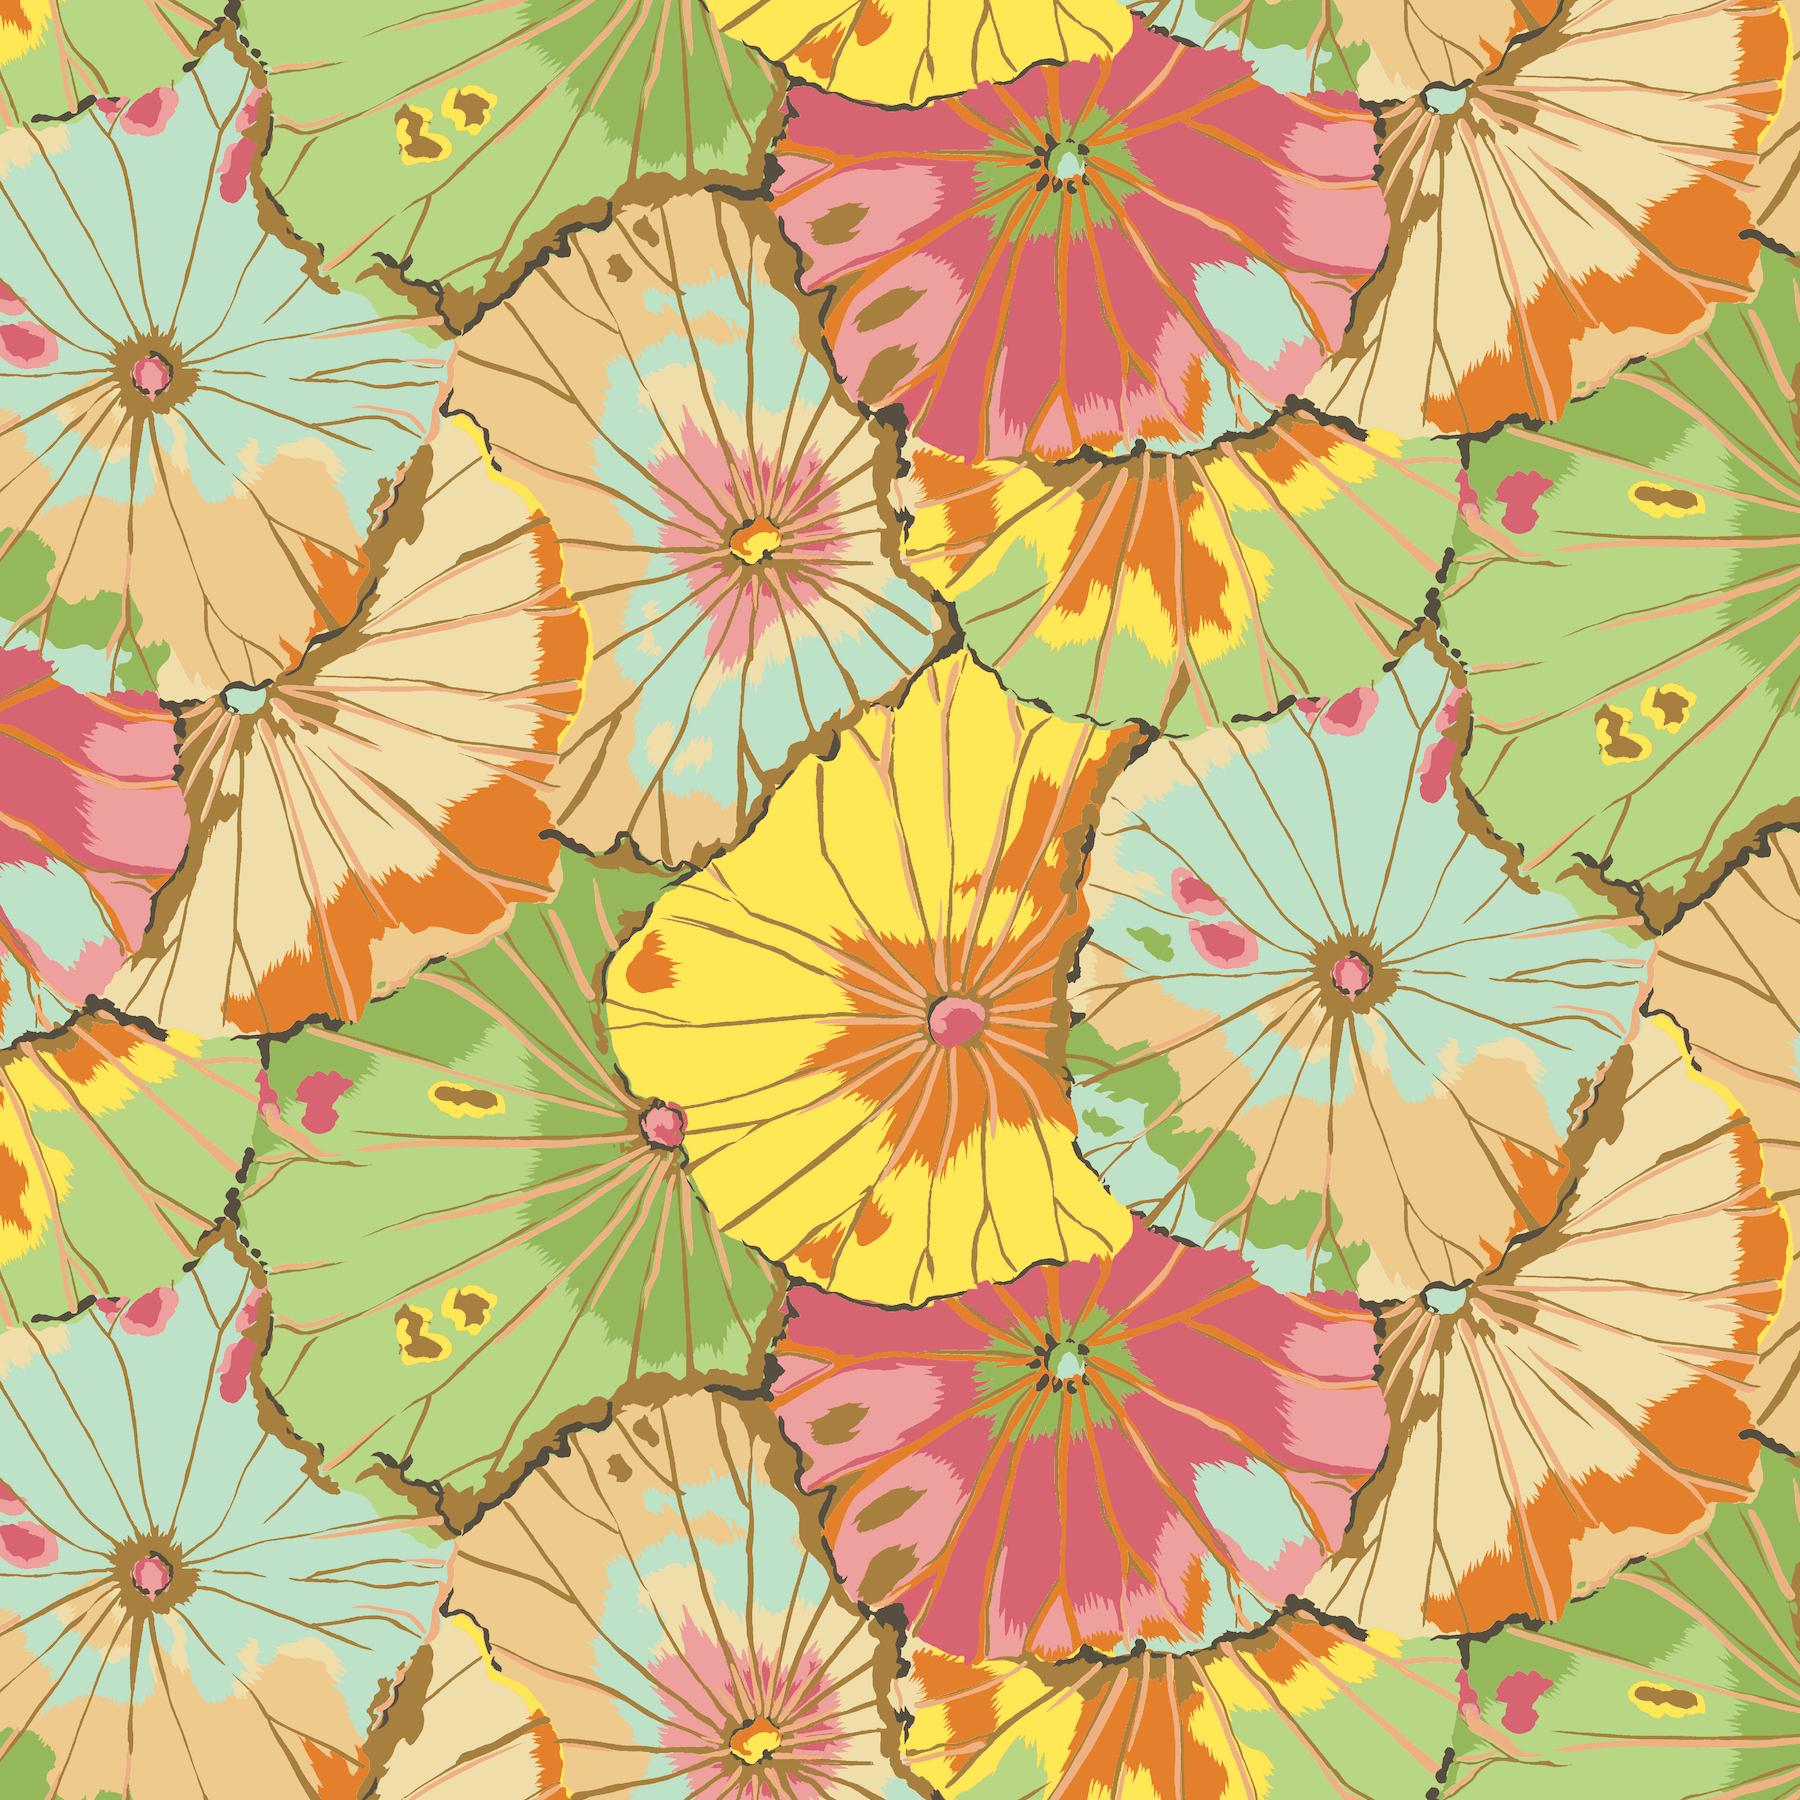 Lotus Leaf - WIDE BACK - QBGP007 - Jade